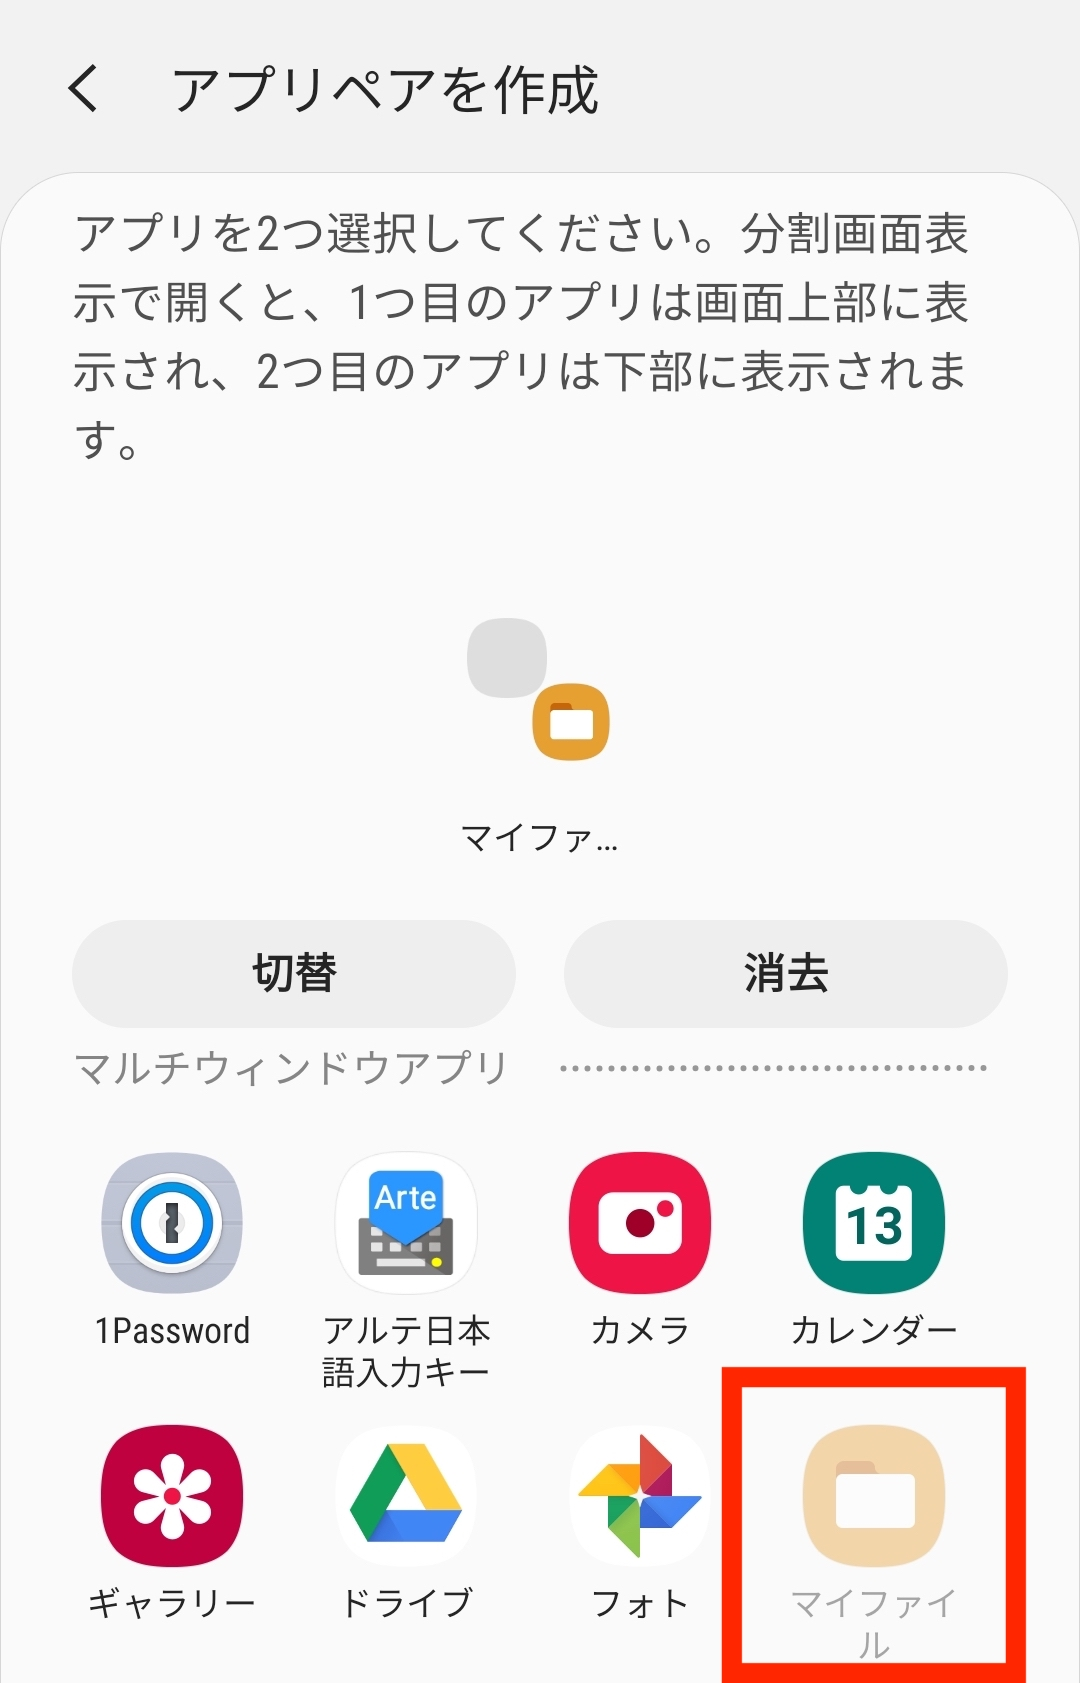 Android 9 Pieではアプリペアに同じアプリを登録できない